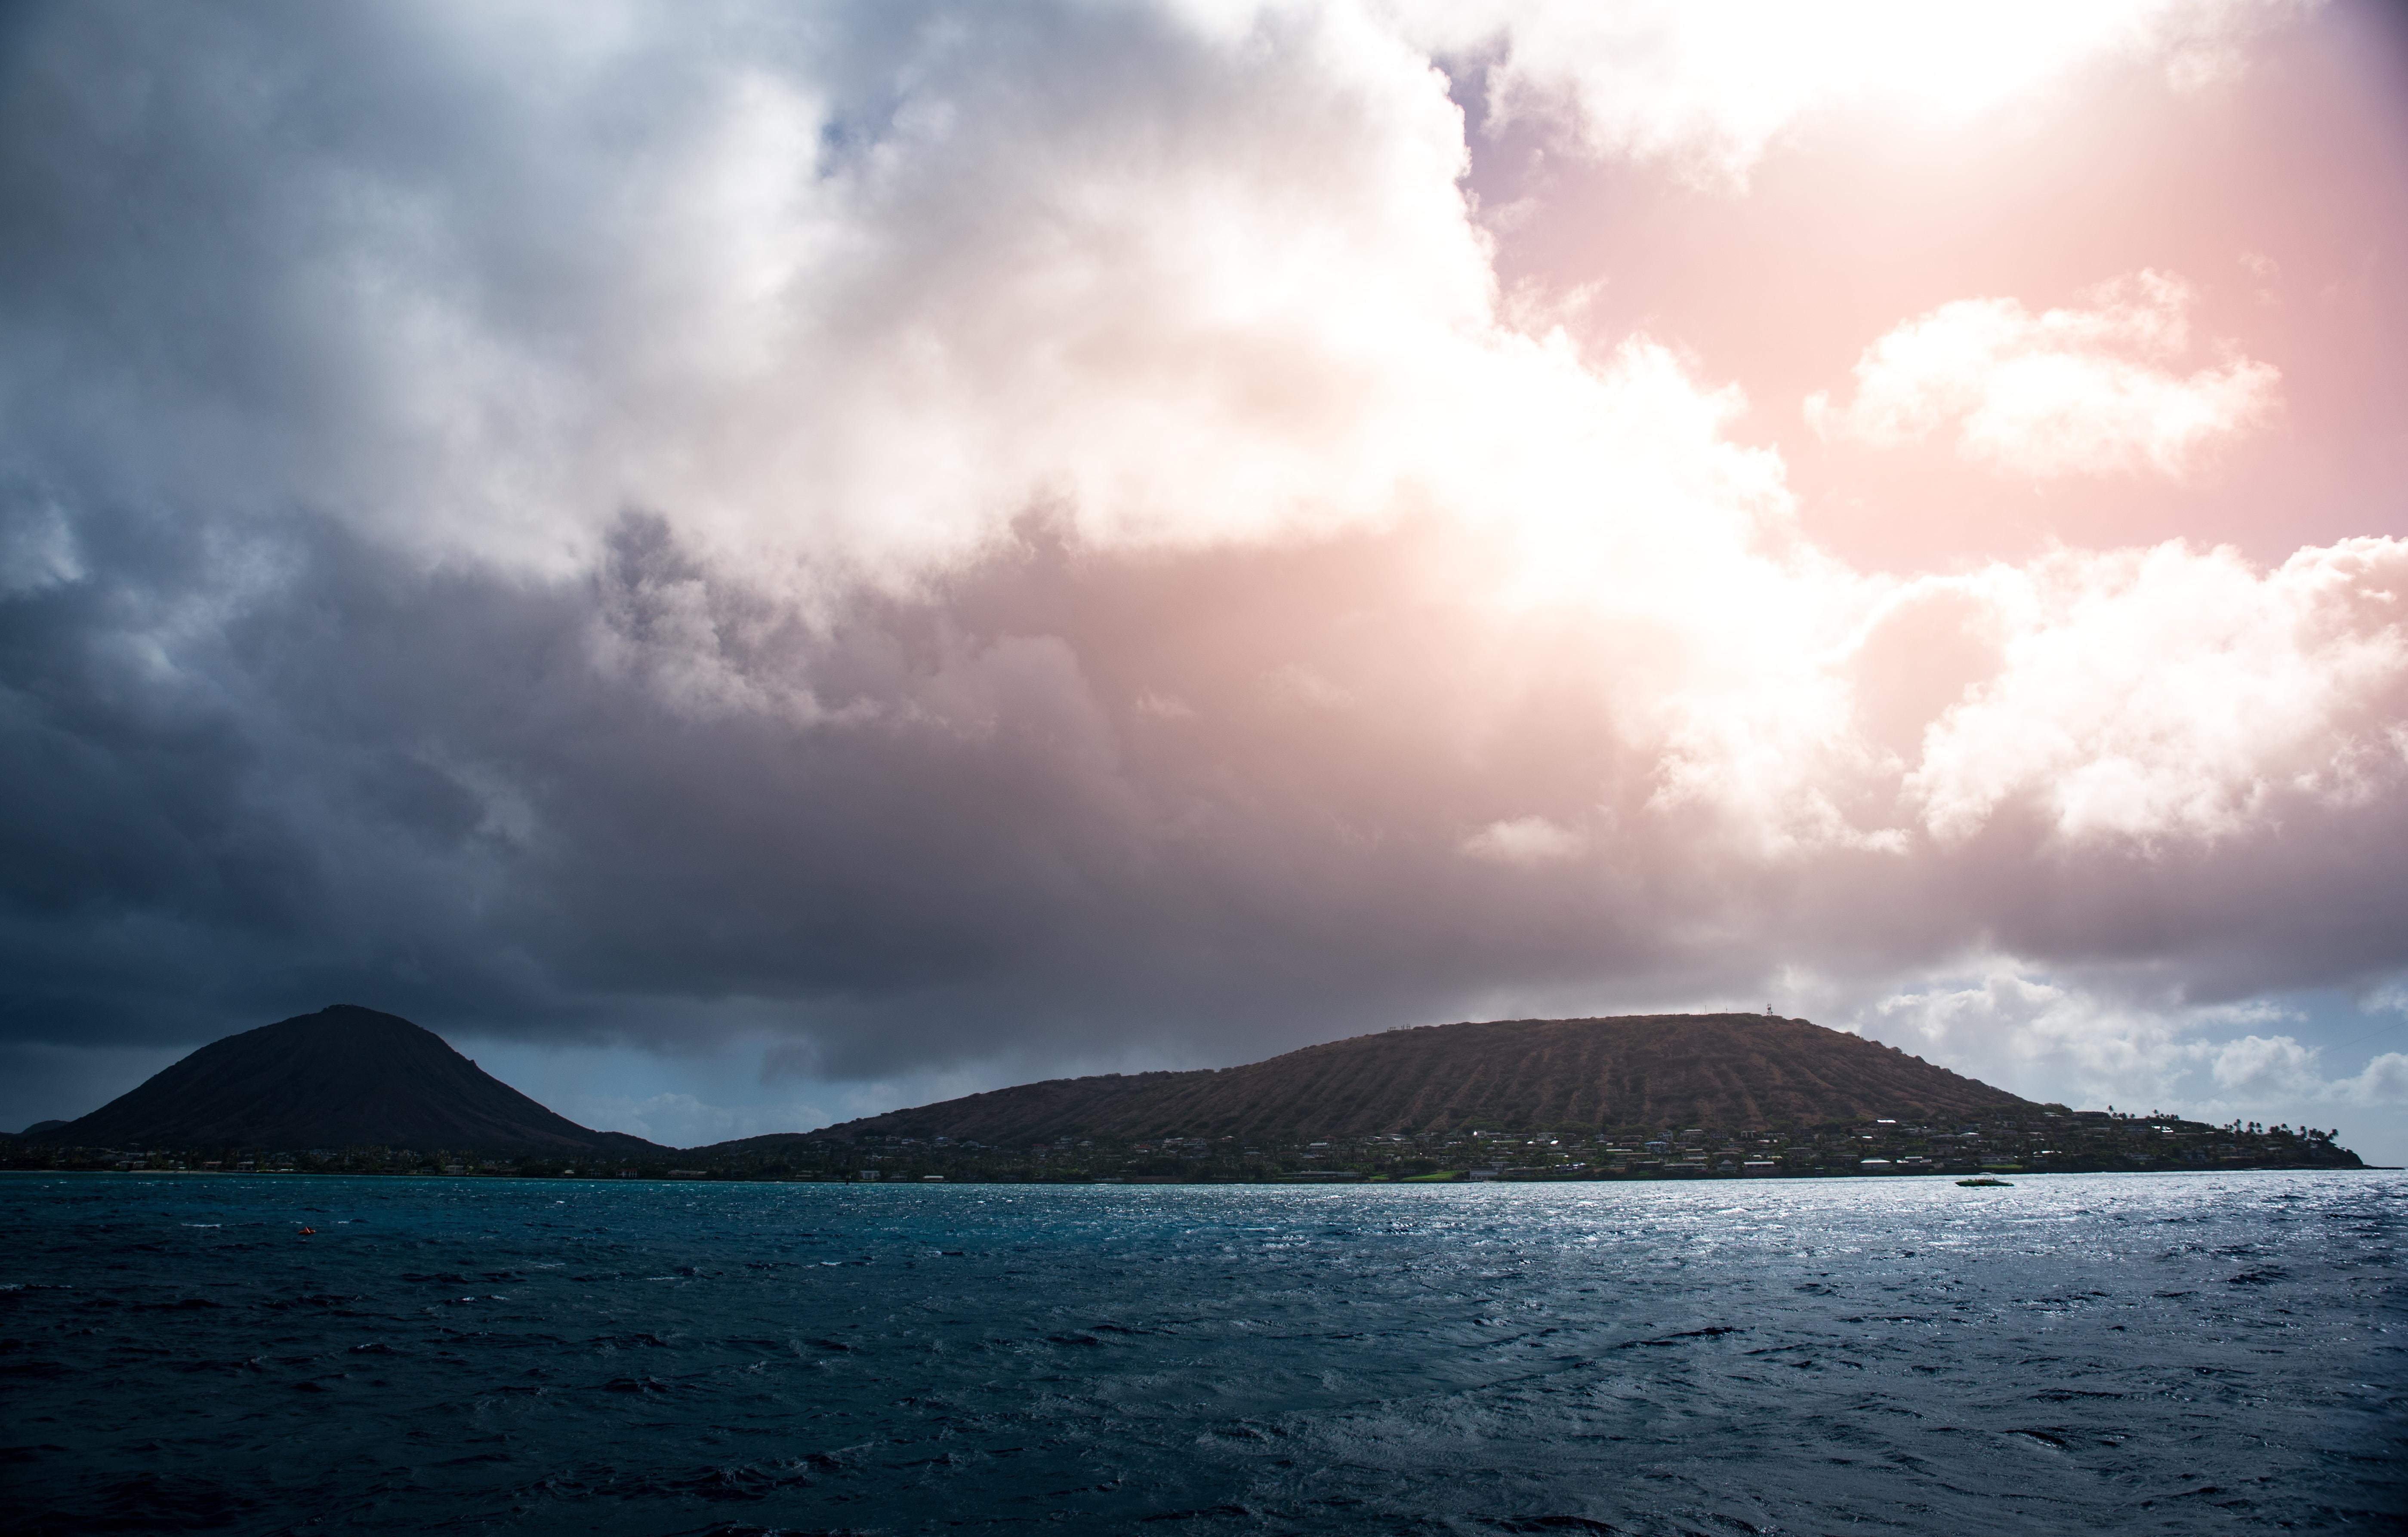 island beside body of water under cloudy sky